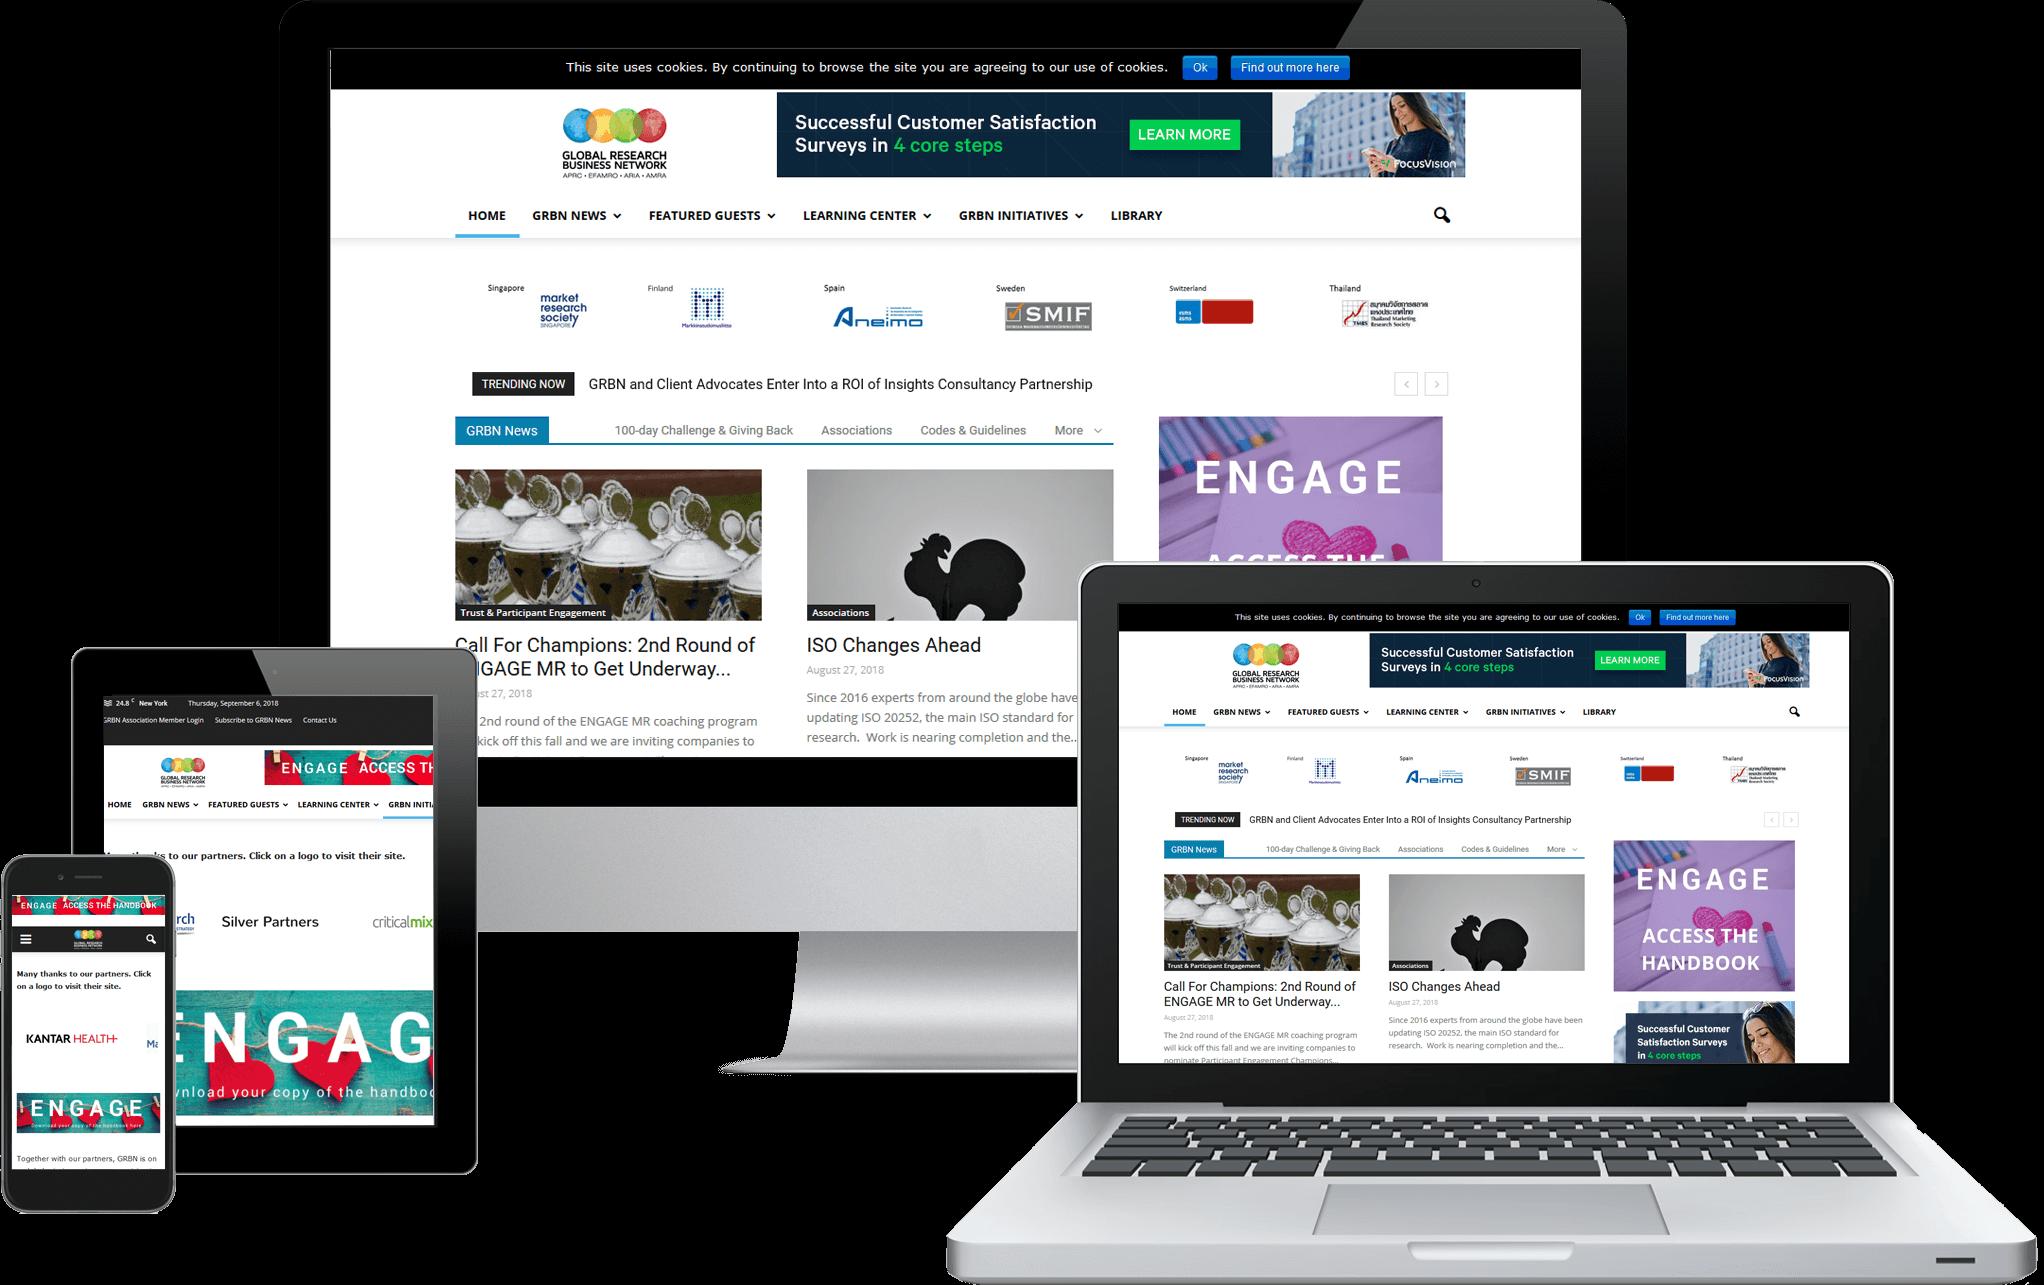 GlobalResearch desktop